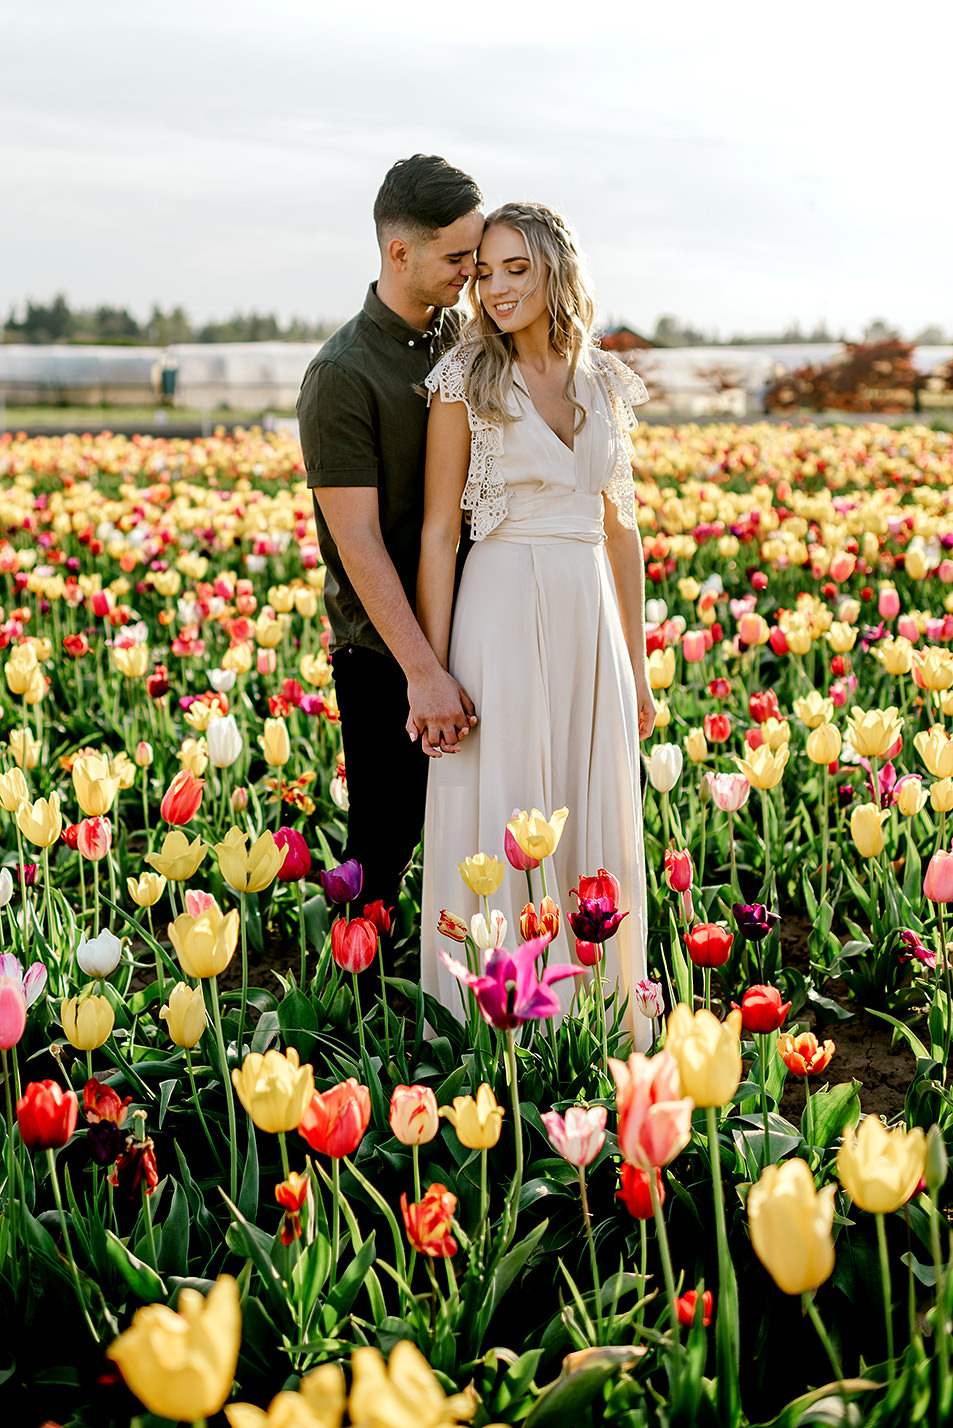 Tulip-field-engagement-session-Portland-Photographer-12.jpg